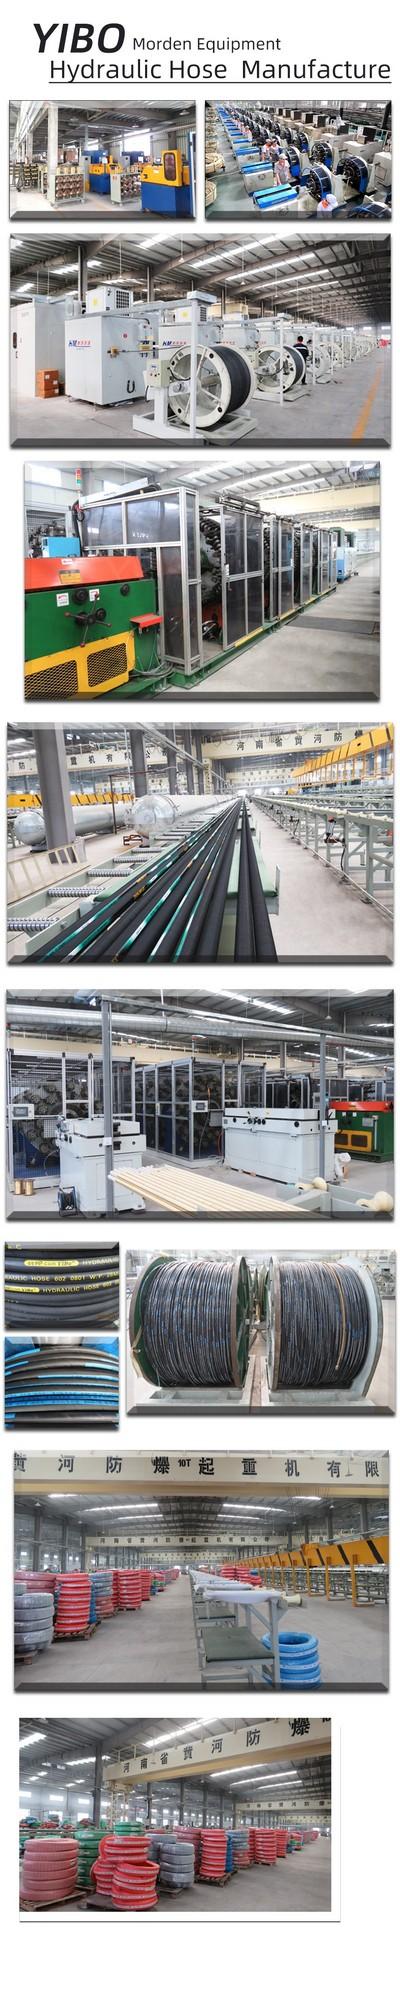 sae 100r12 wire spiral hydraulic rubber hose 4